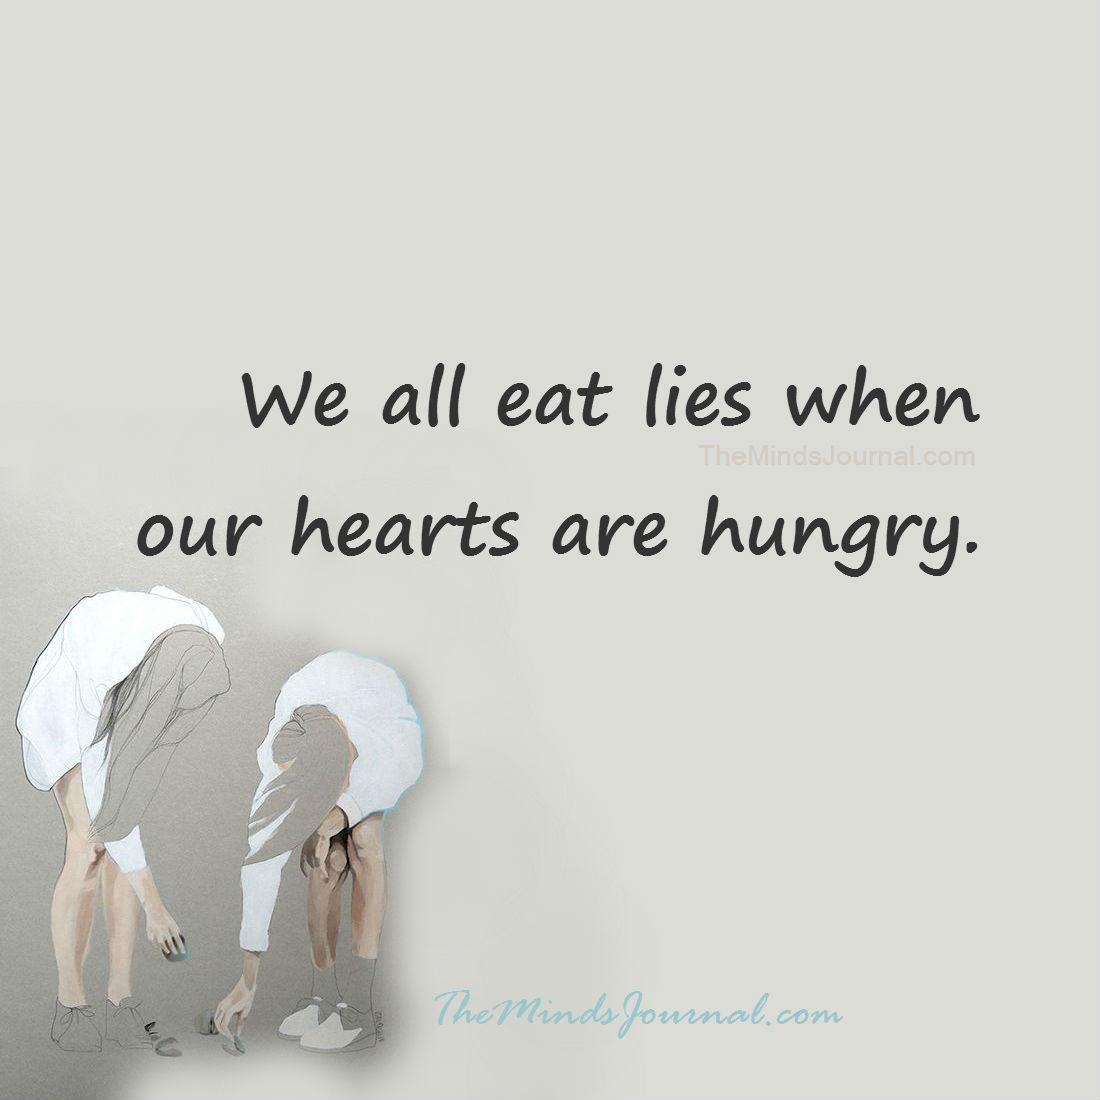 We all eat lies